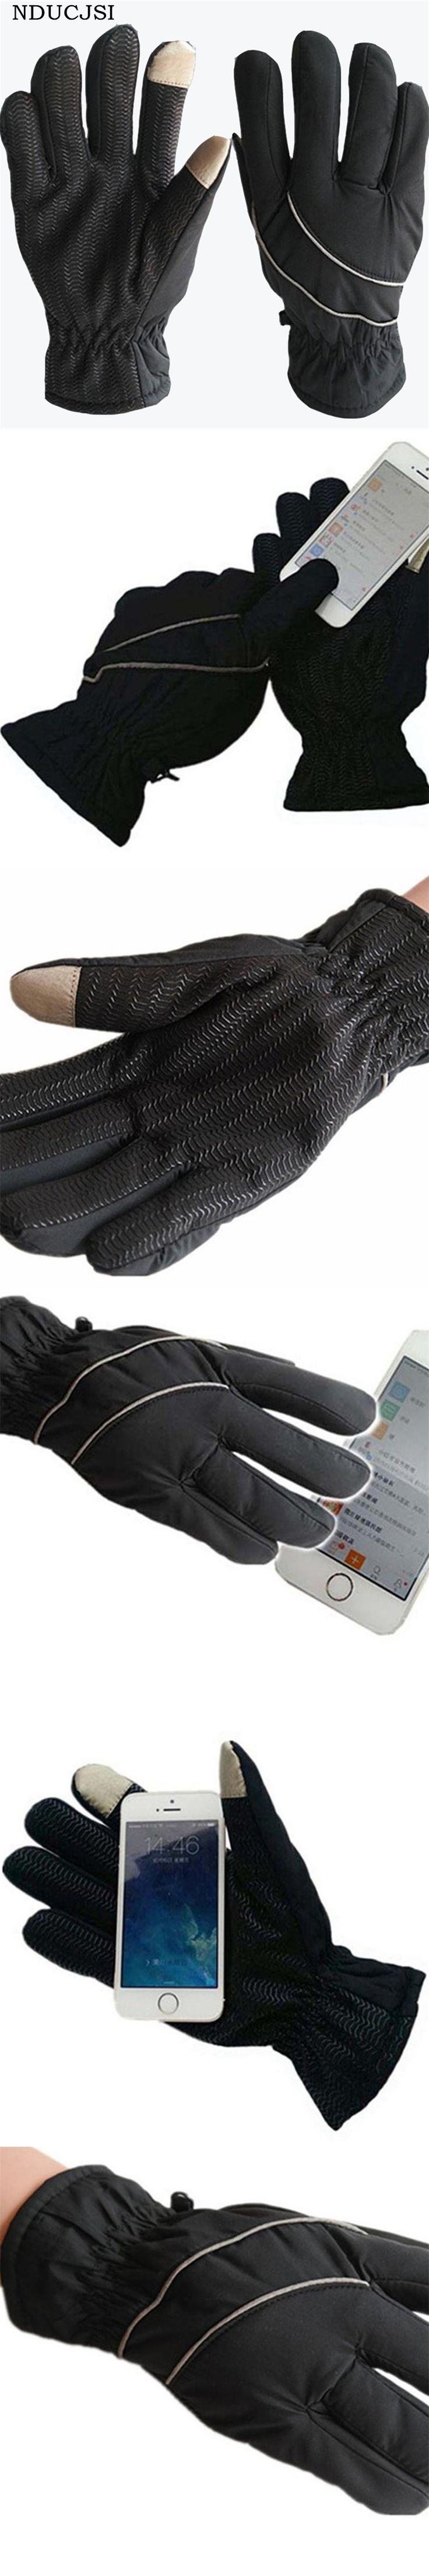 Windproof Gloves Men Anti Slip Gloves Snowmobile Luvas Touched Screen Glove Snowboard Breath Winter Stripe Guante Male Moto G021